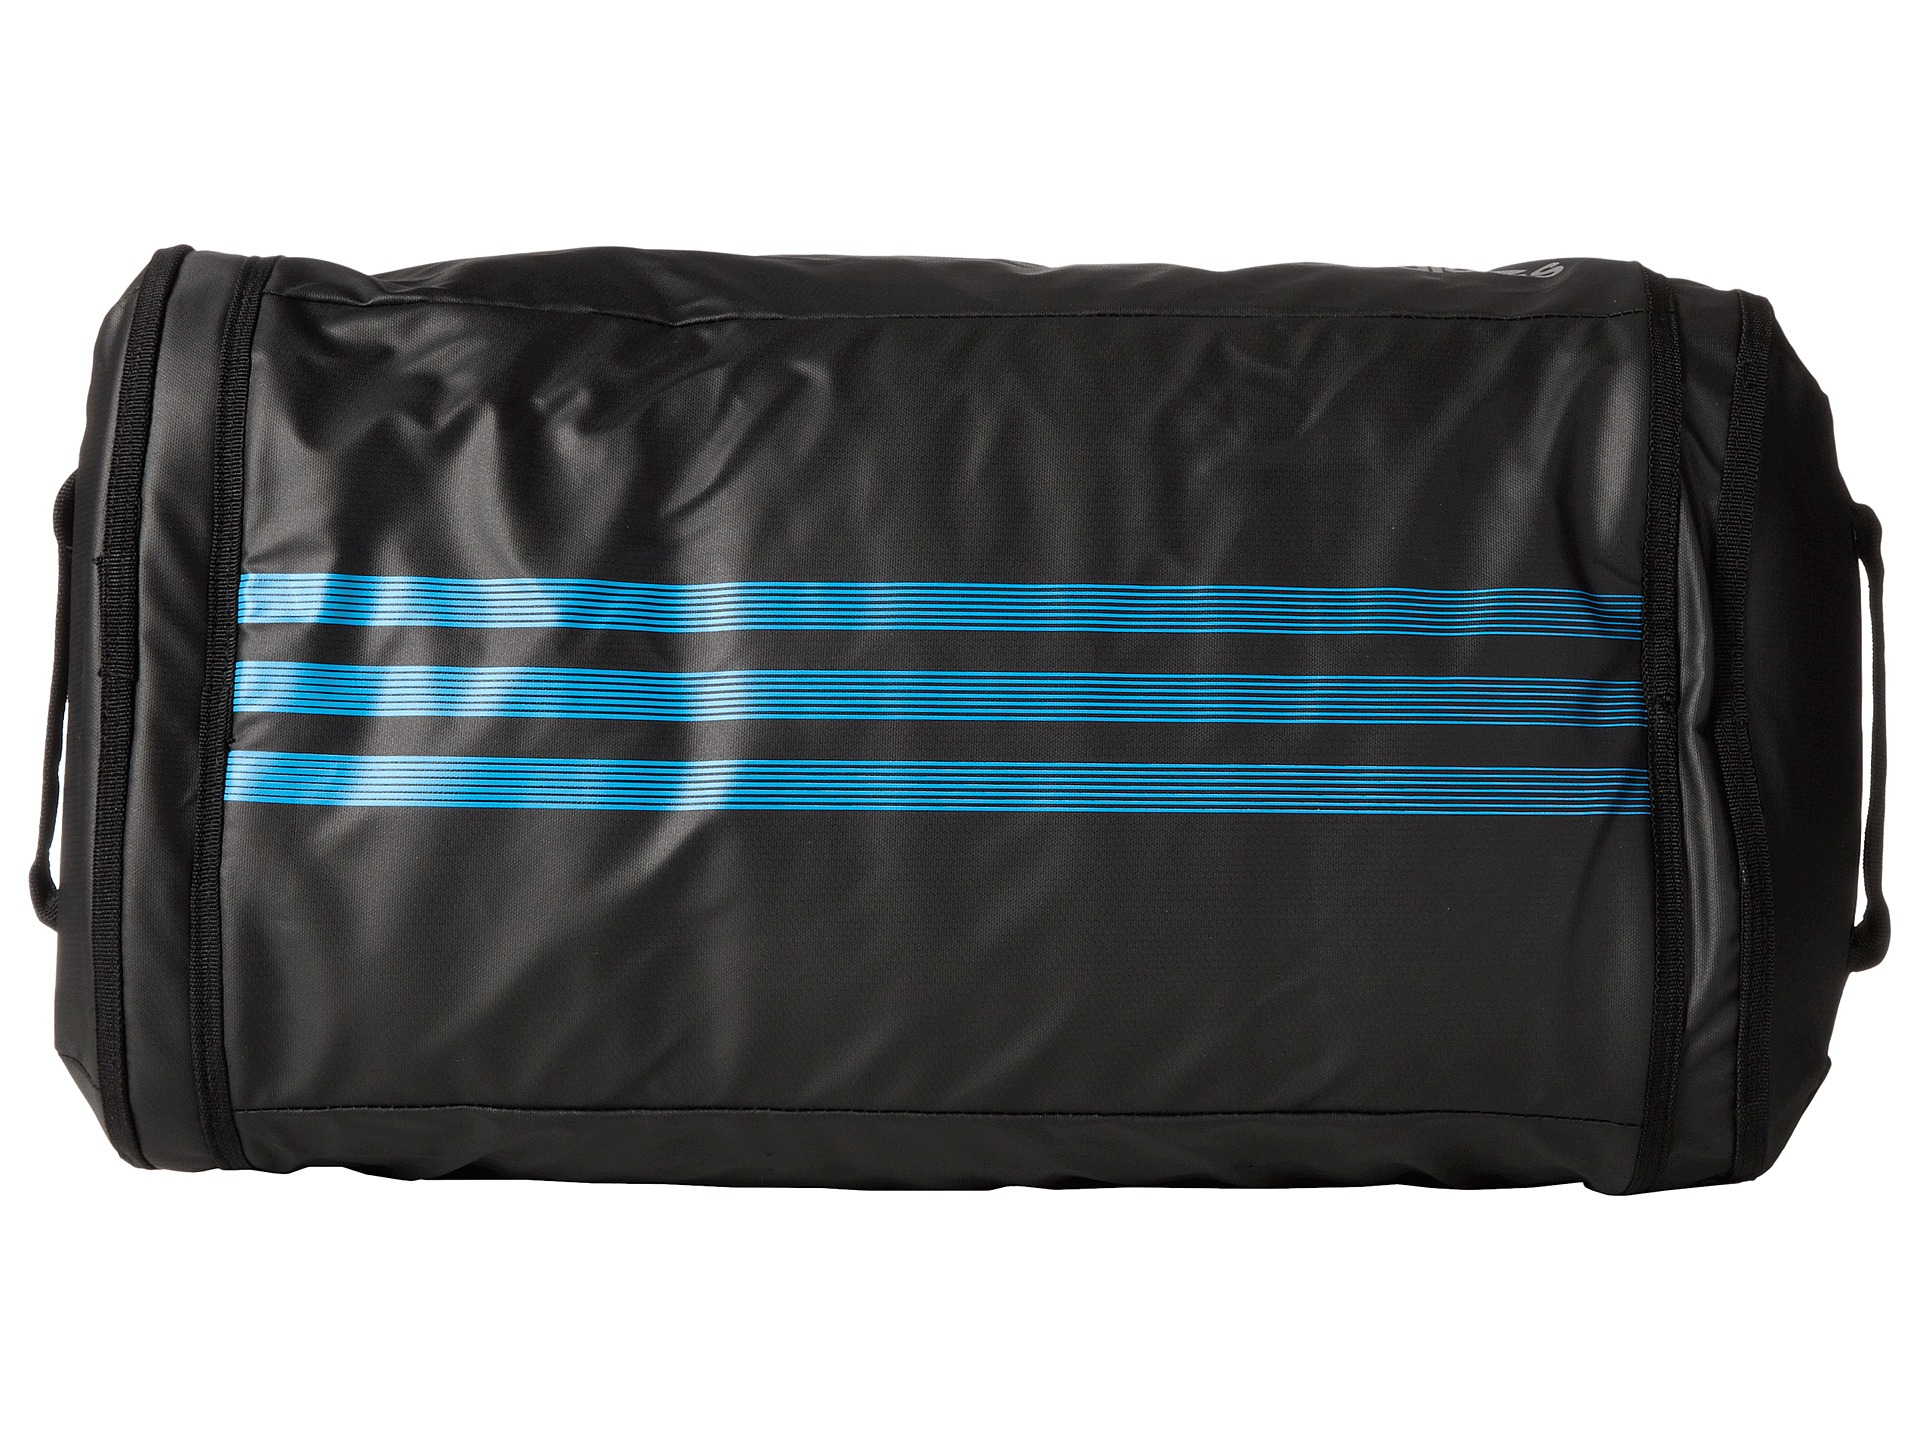 d951f3888f81 Lyst - adidas Climaproof Menace Duffel in Blue for Men